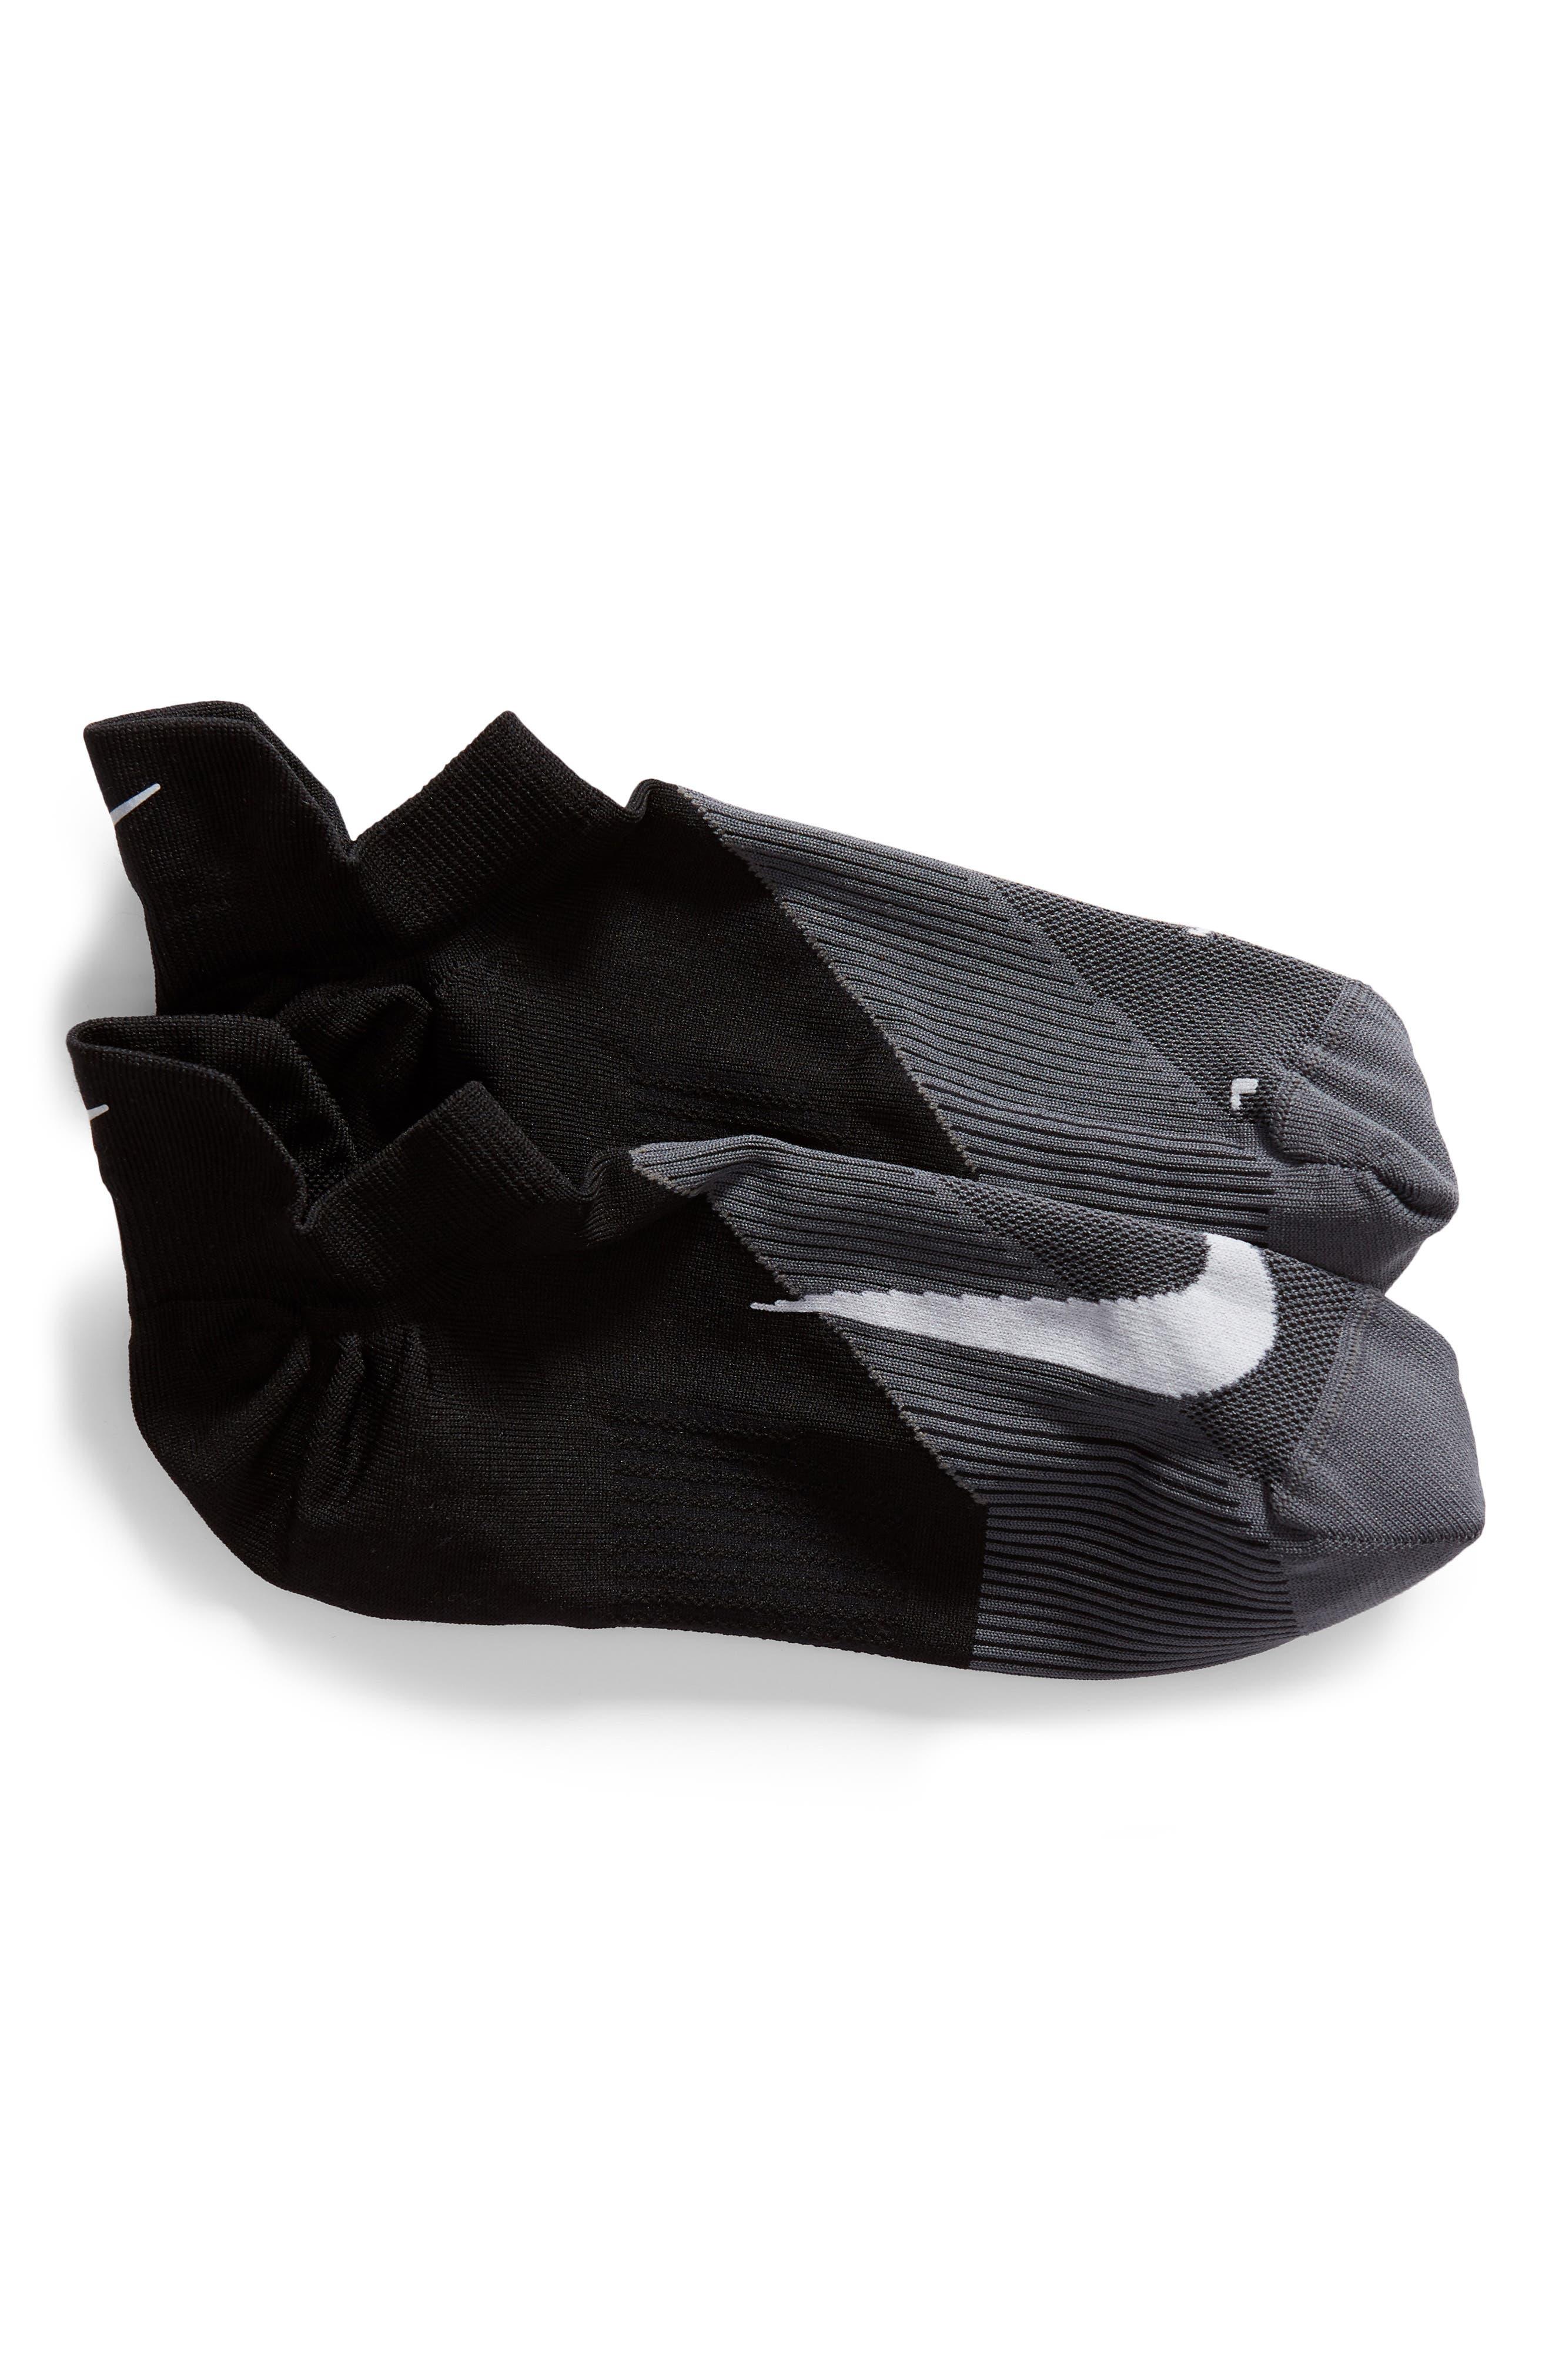 Elite Lightweight No-Show Socks,                             Main thumbnail 1, color,                             BLACK/ WHITE